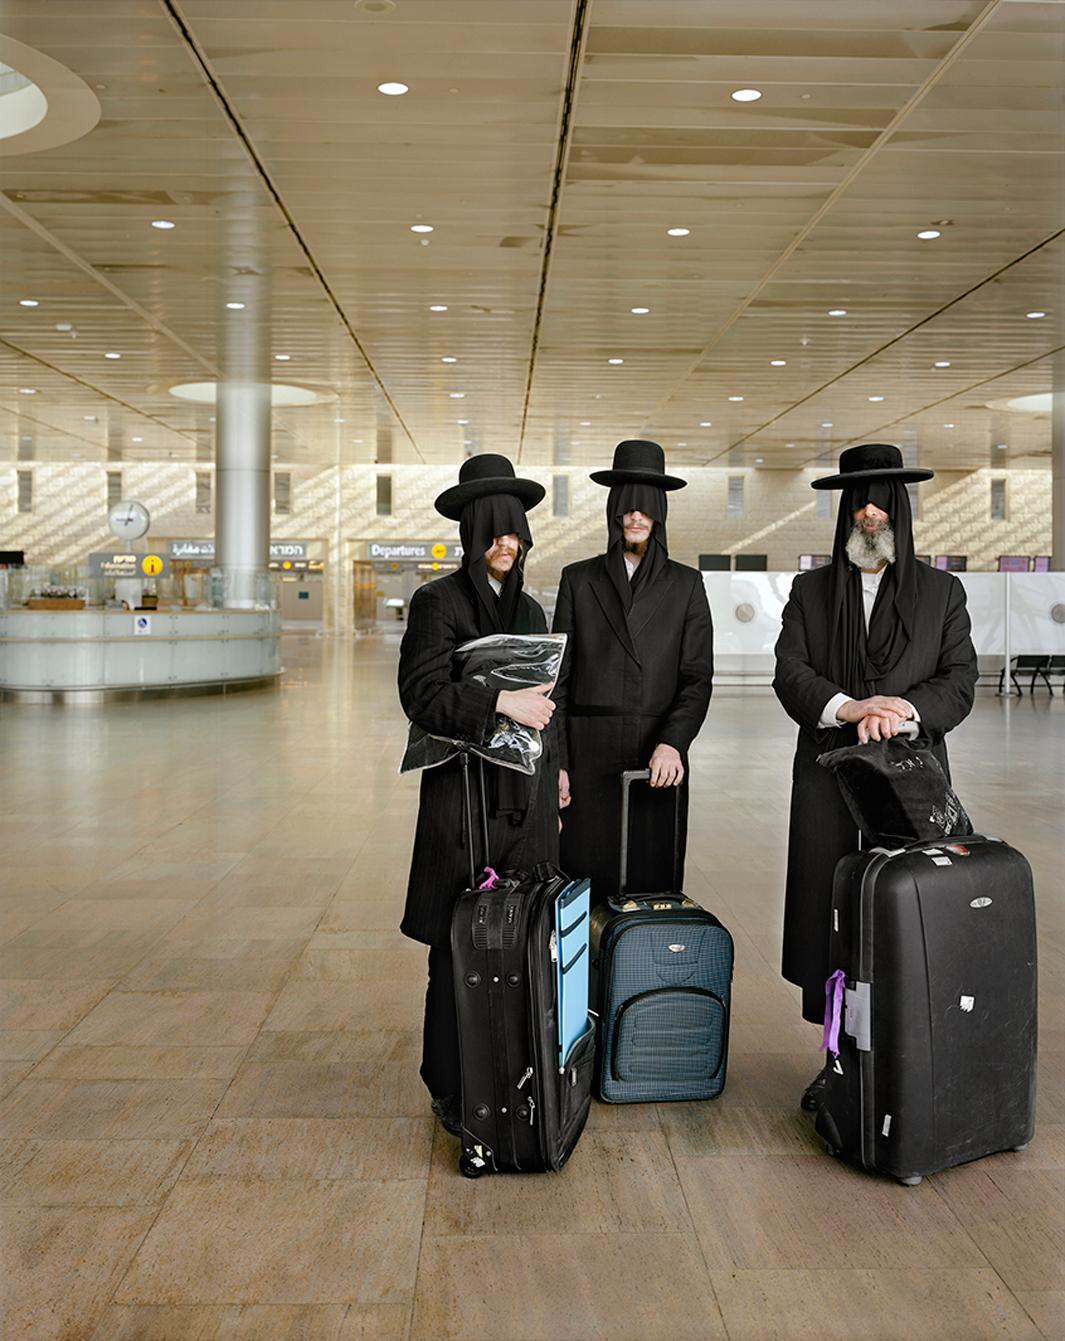 Ben Gurion Airport, 2010